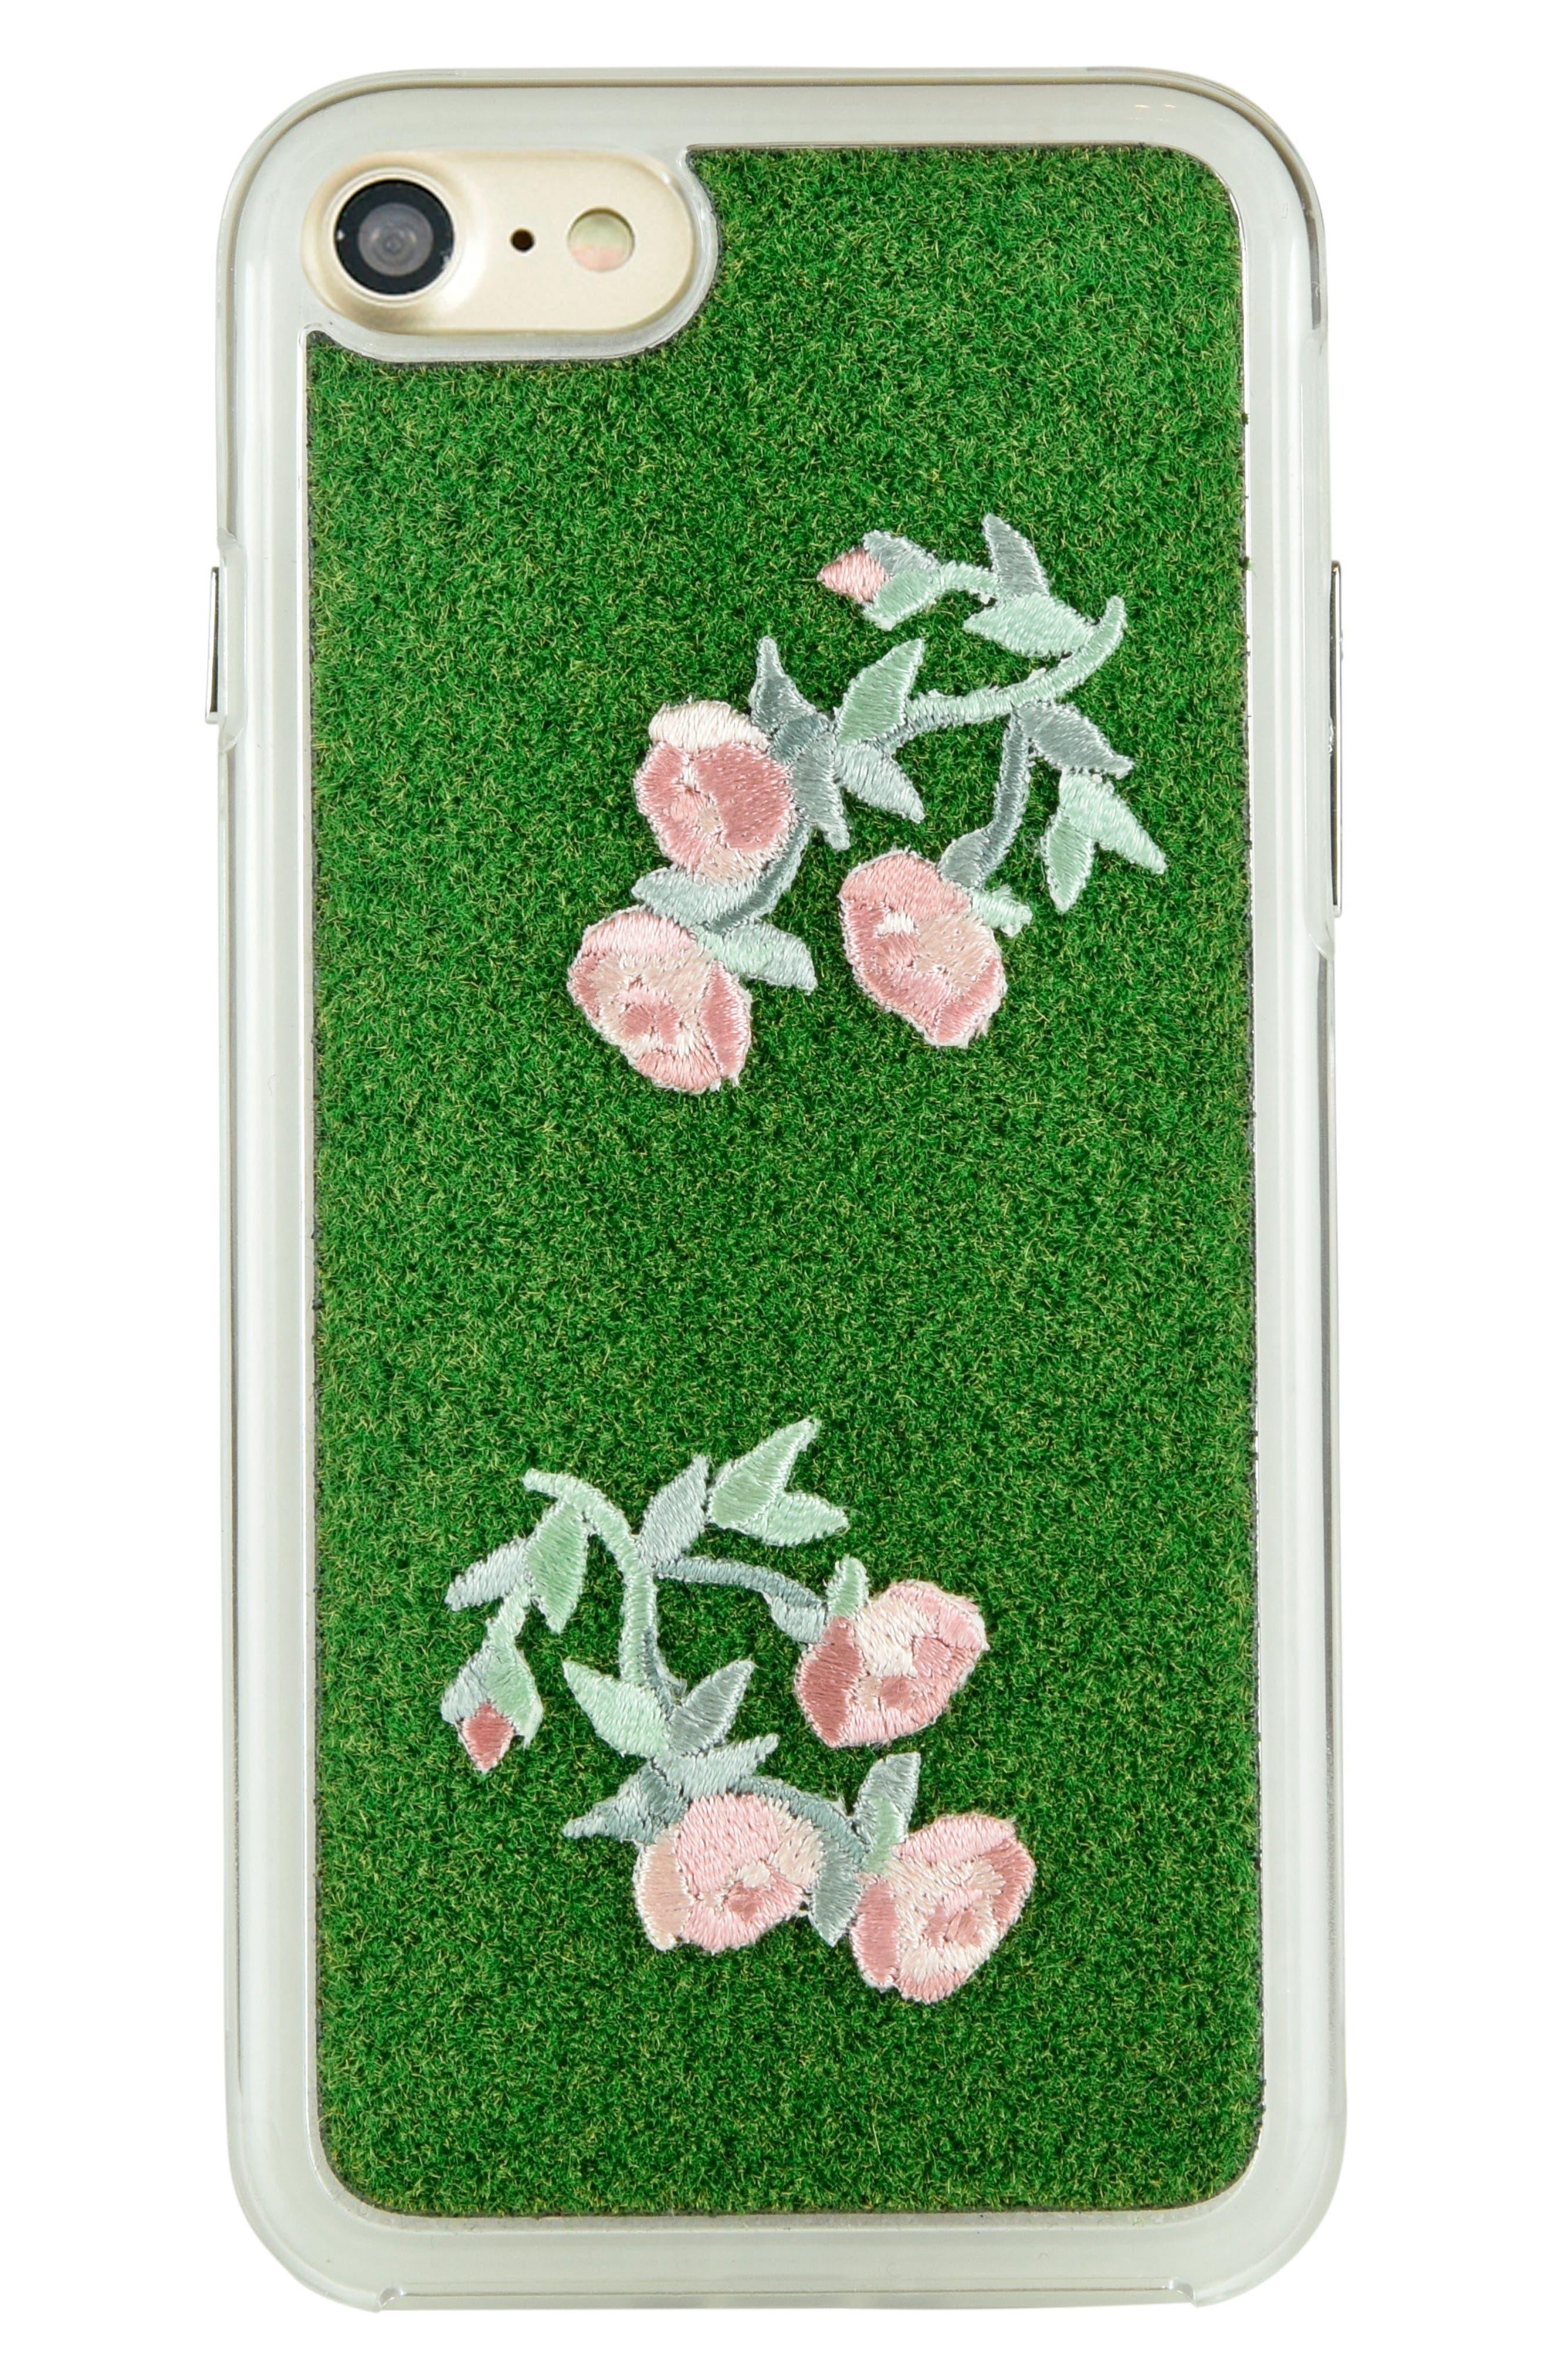 SHIBAFUL Mini Rose Portable Park iPhone 7 & iPhone 7 Plus Case